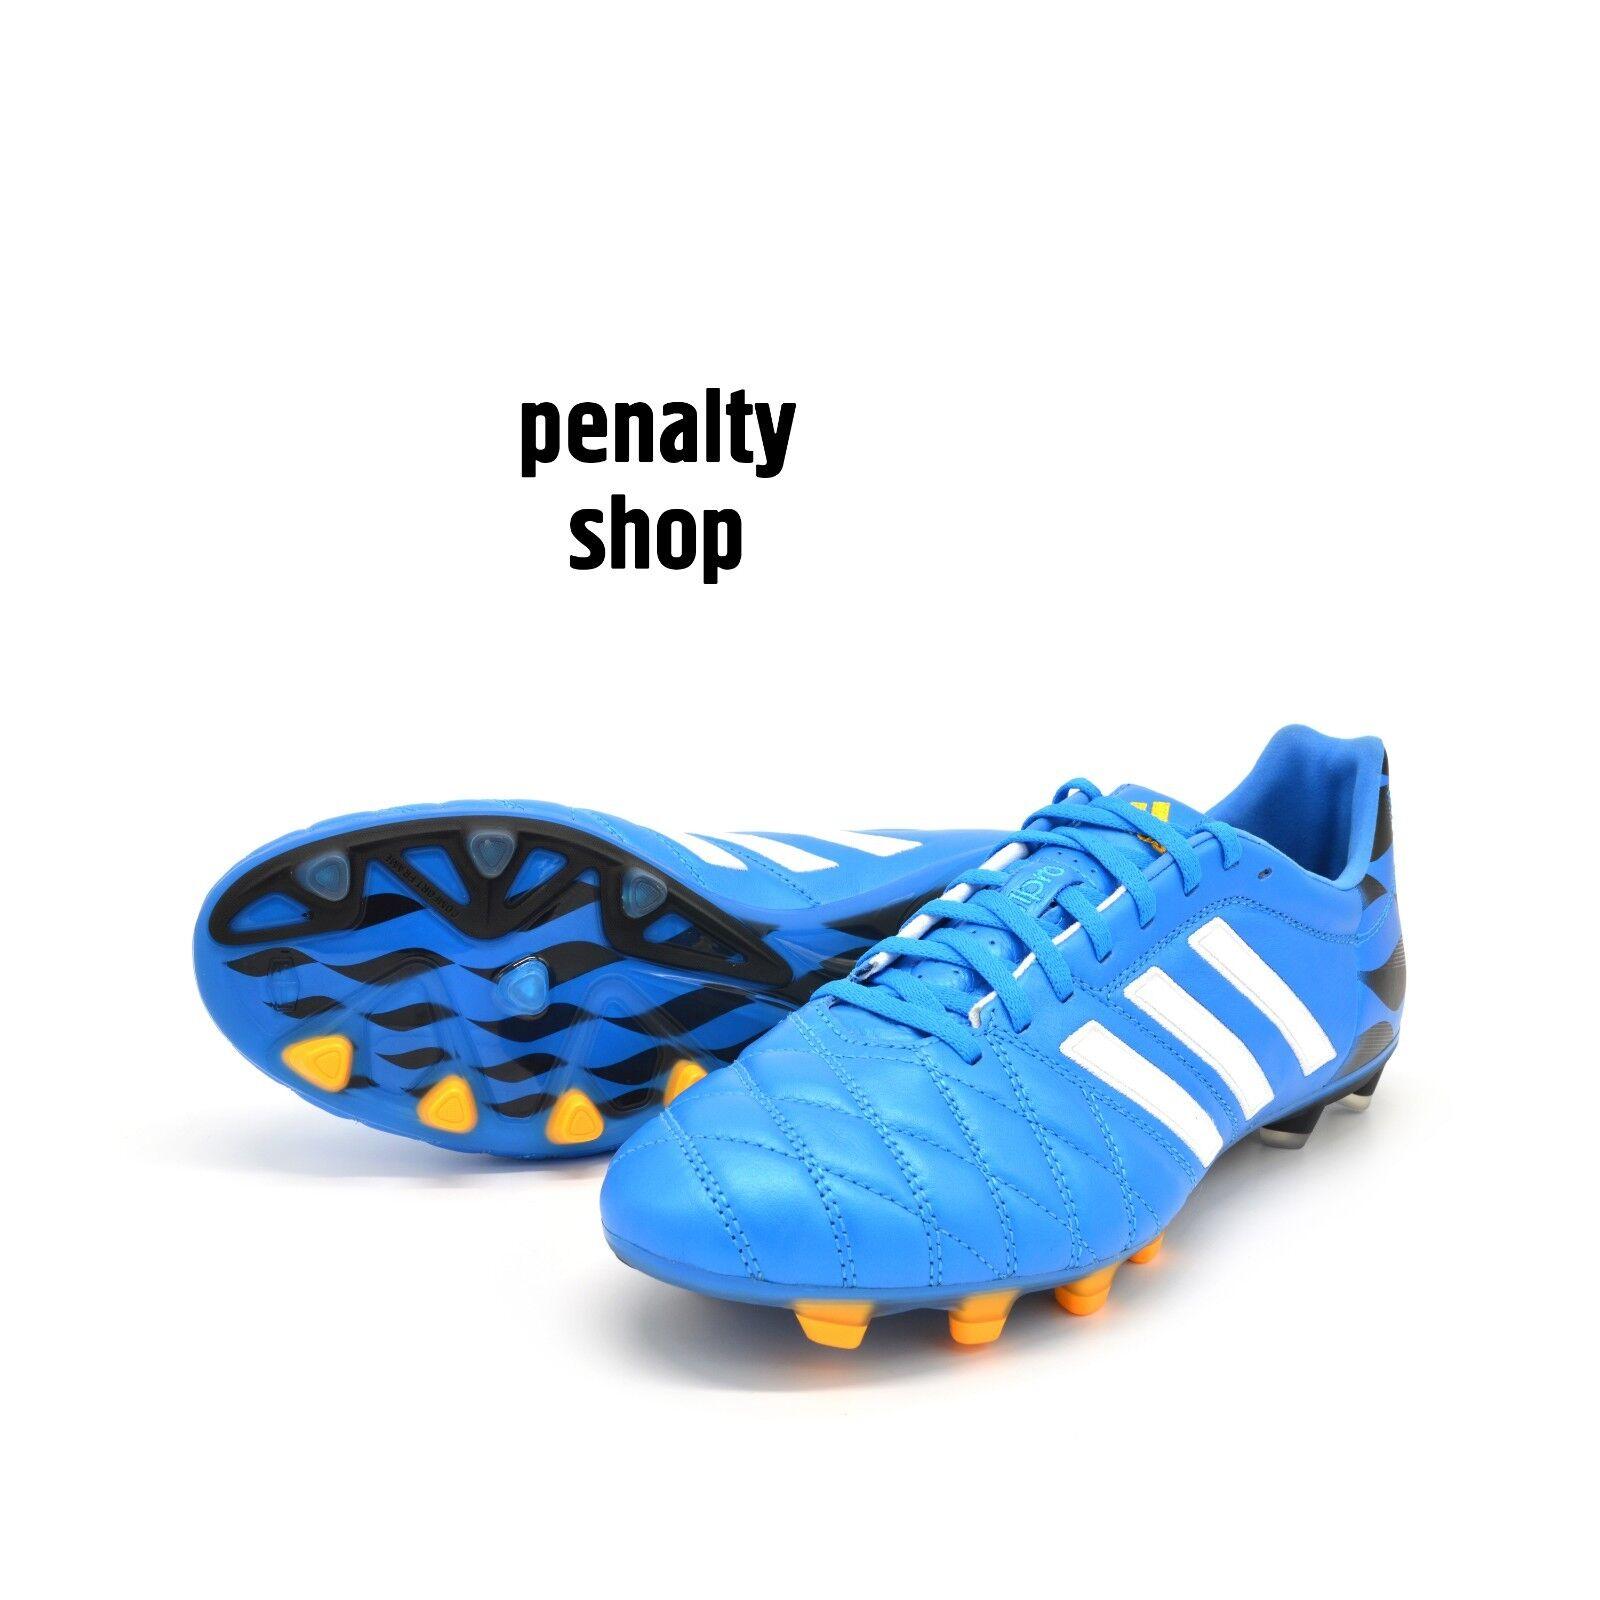 Adidas 11Pro FG M17743 Tony Kroos Rara Edición Limitada